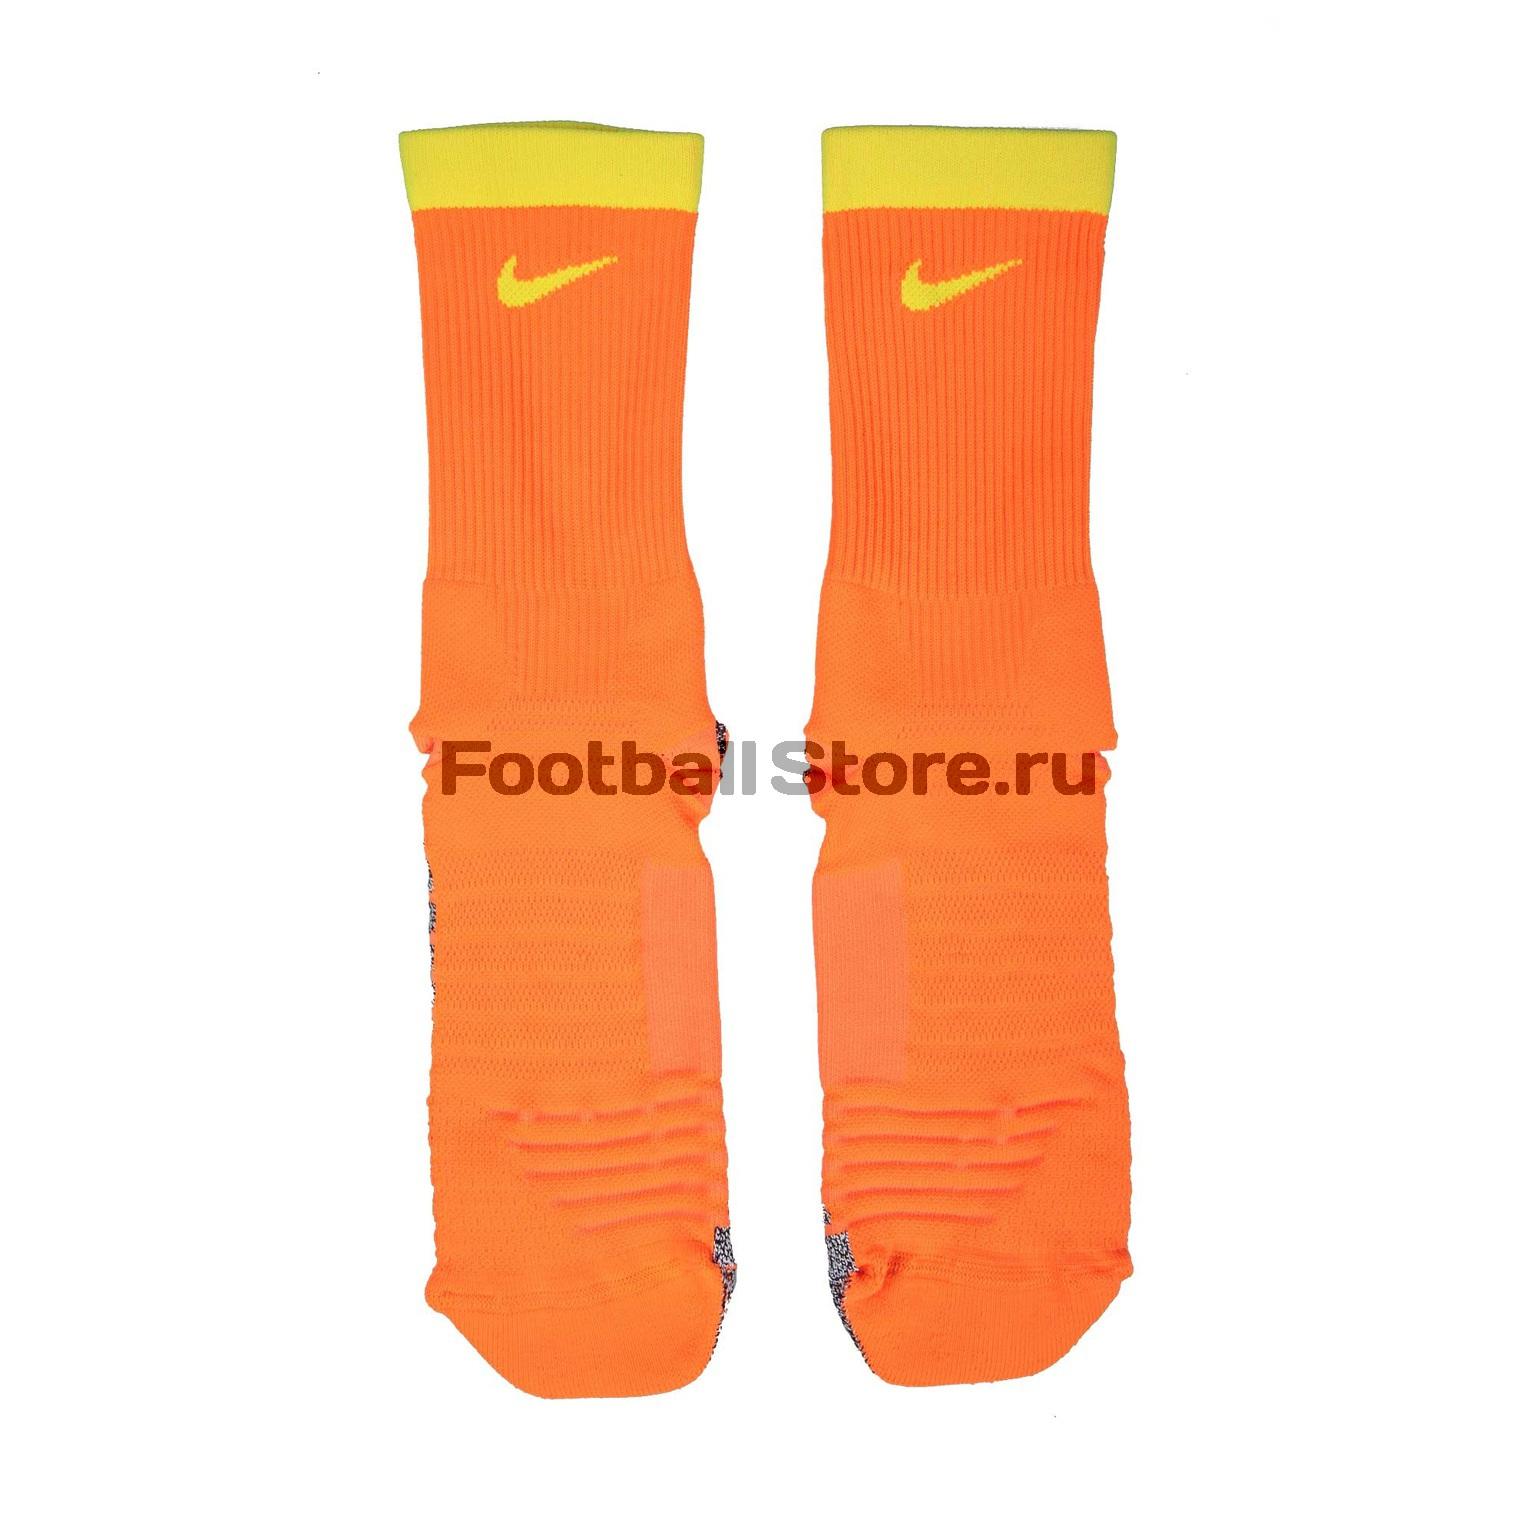 Носки Nike Носки Nike GRIP Strike Lightweight Crew SX5089-804 носки nike носки nike grip strike lightweight sx5089 525